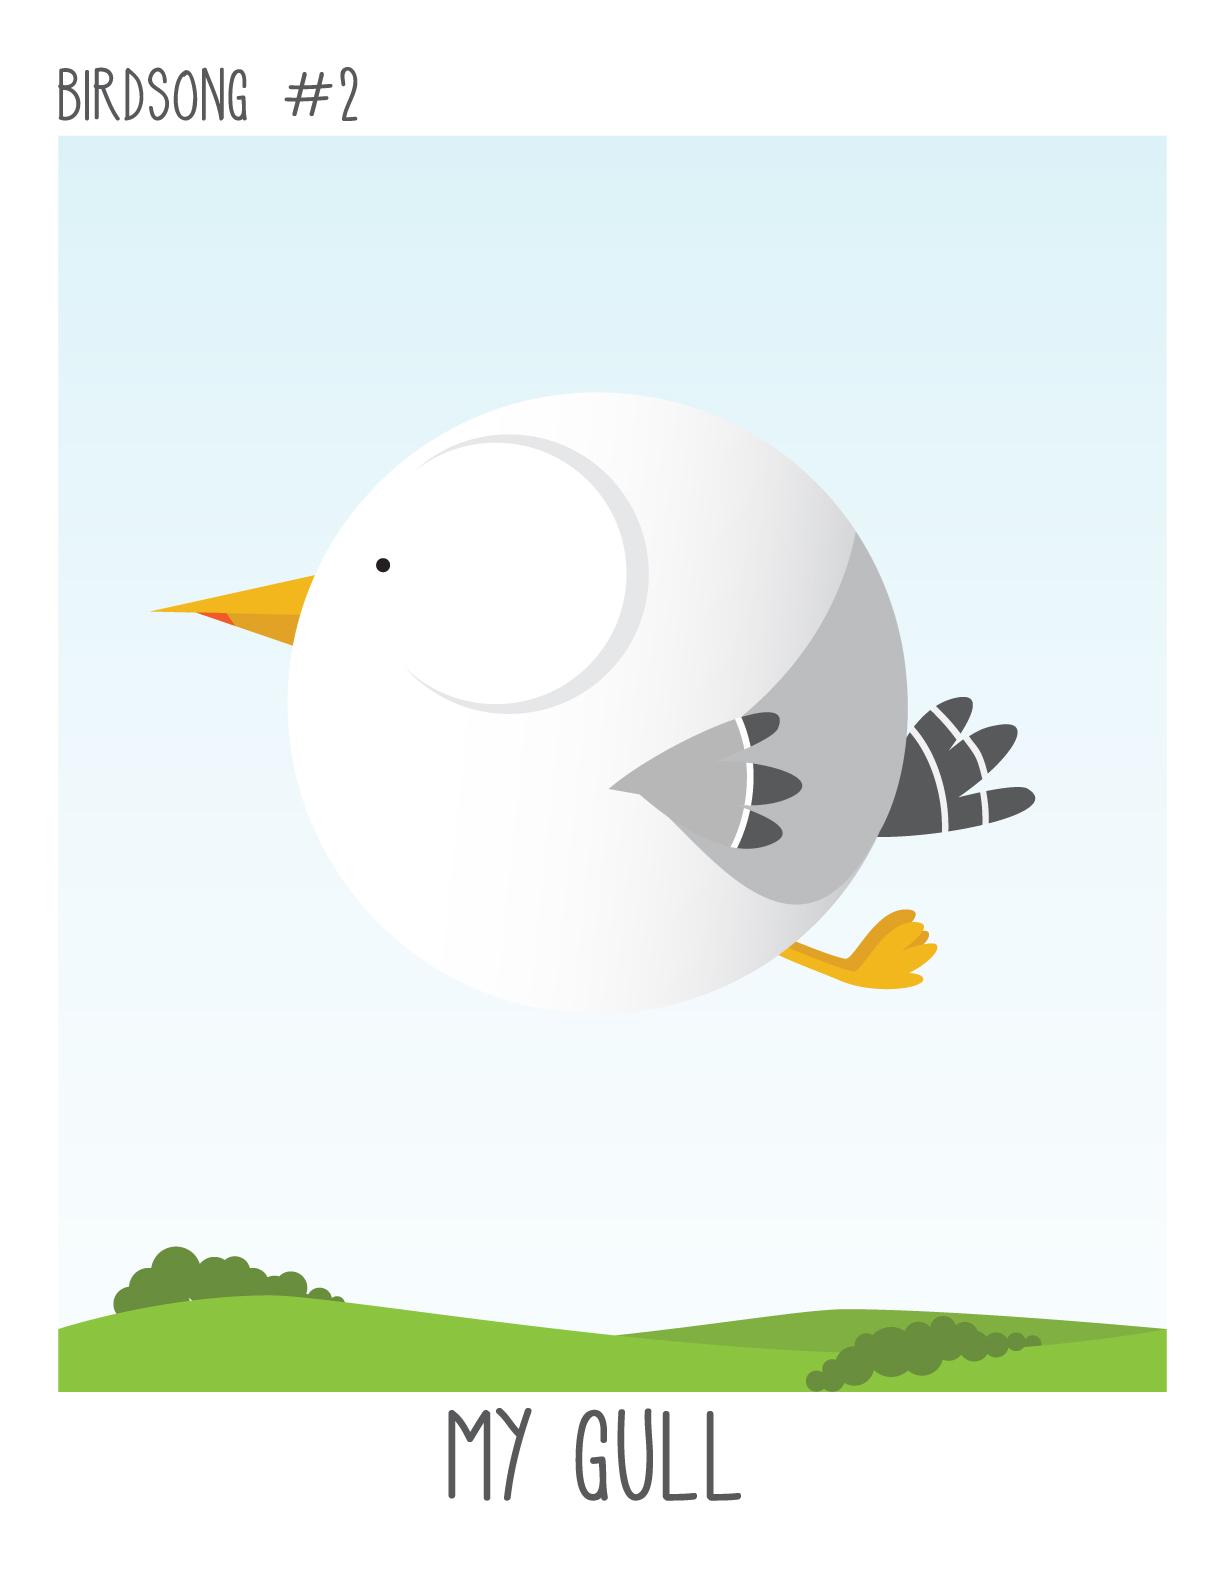 Bird song #2 Gull.jpg